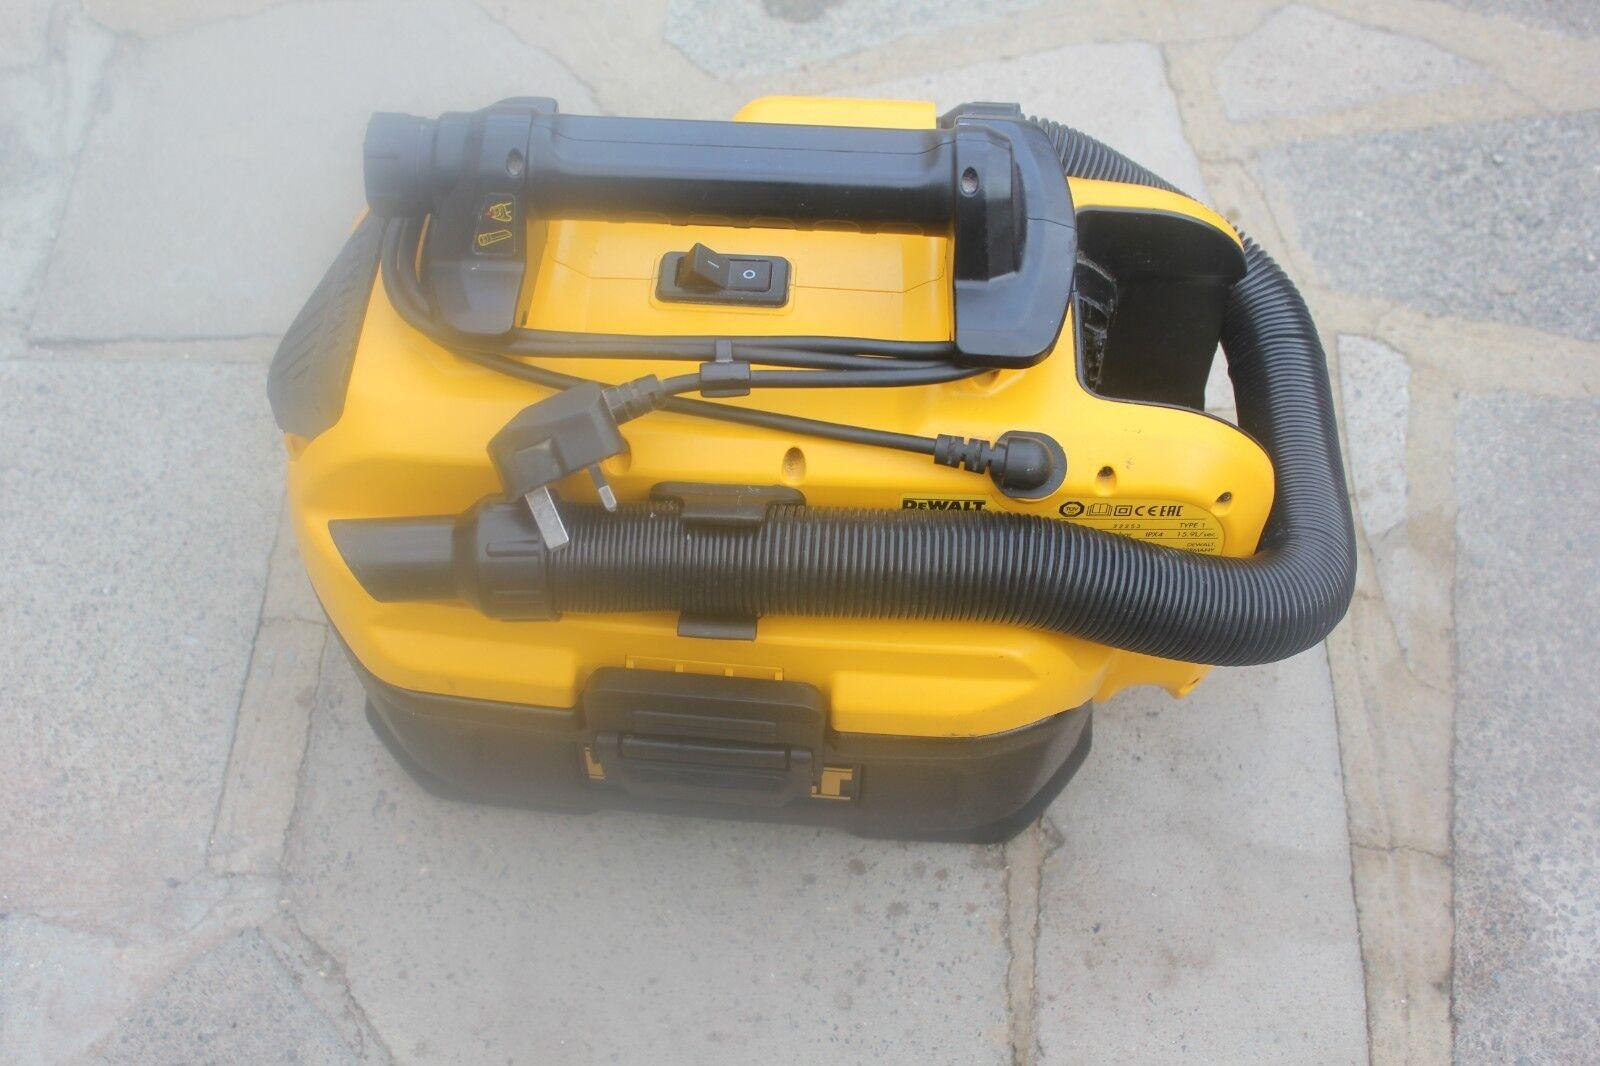 DeWalt DCV582 FLEXVOLT XR 14.4V 18v Wet Dry Cordless Corded Vacuum